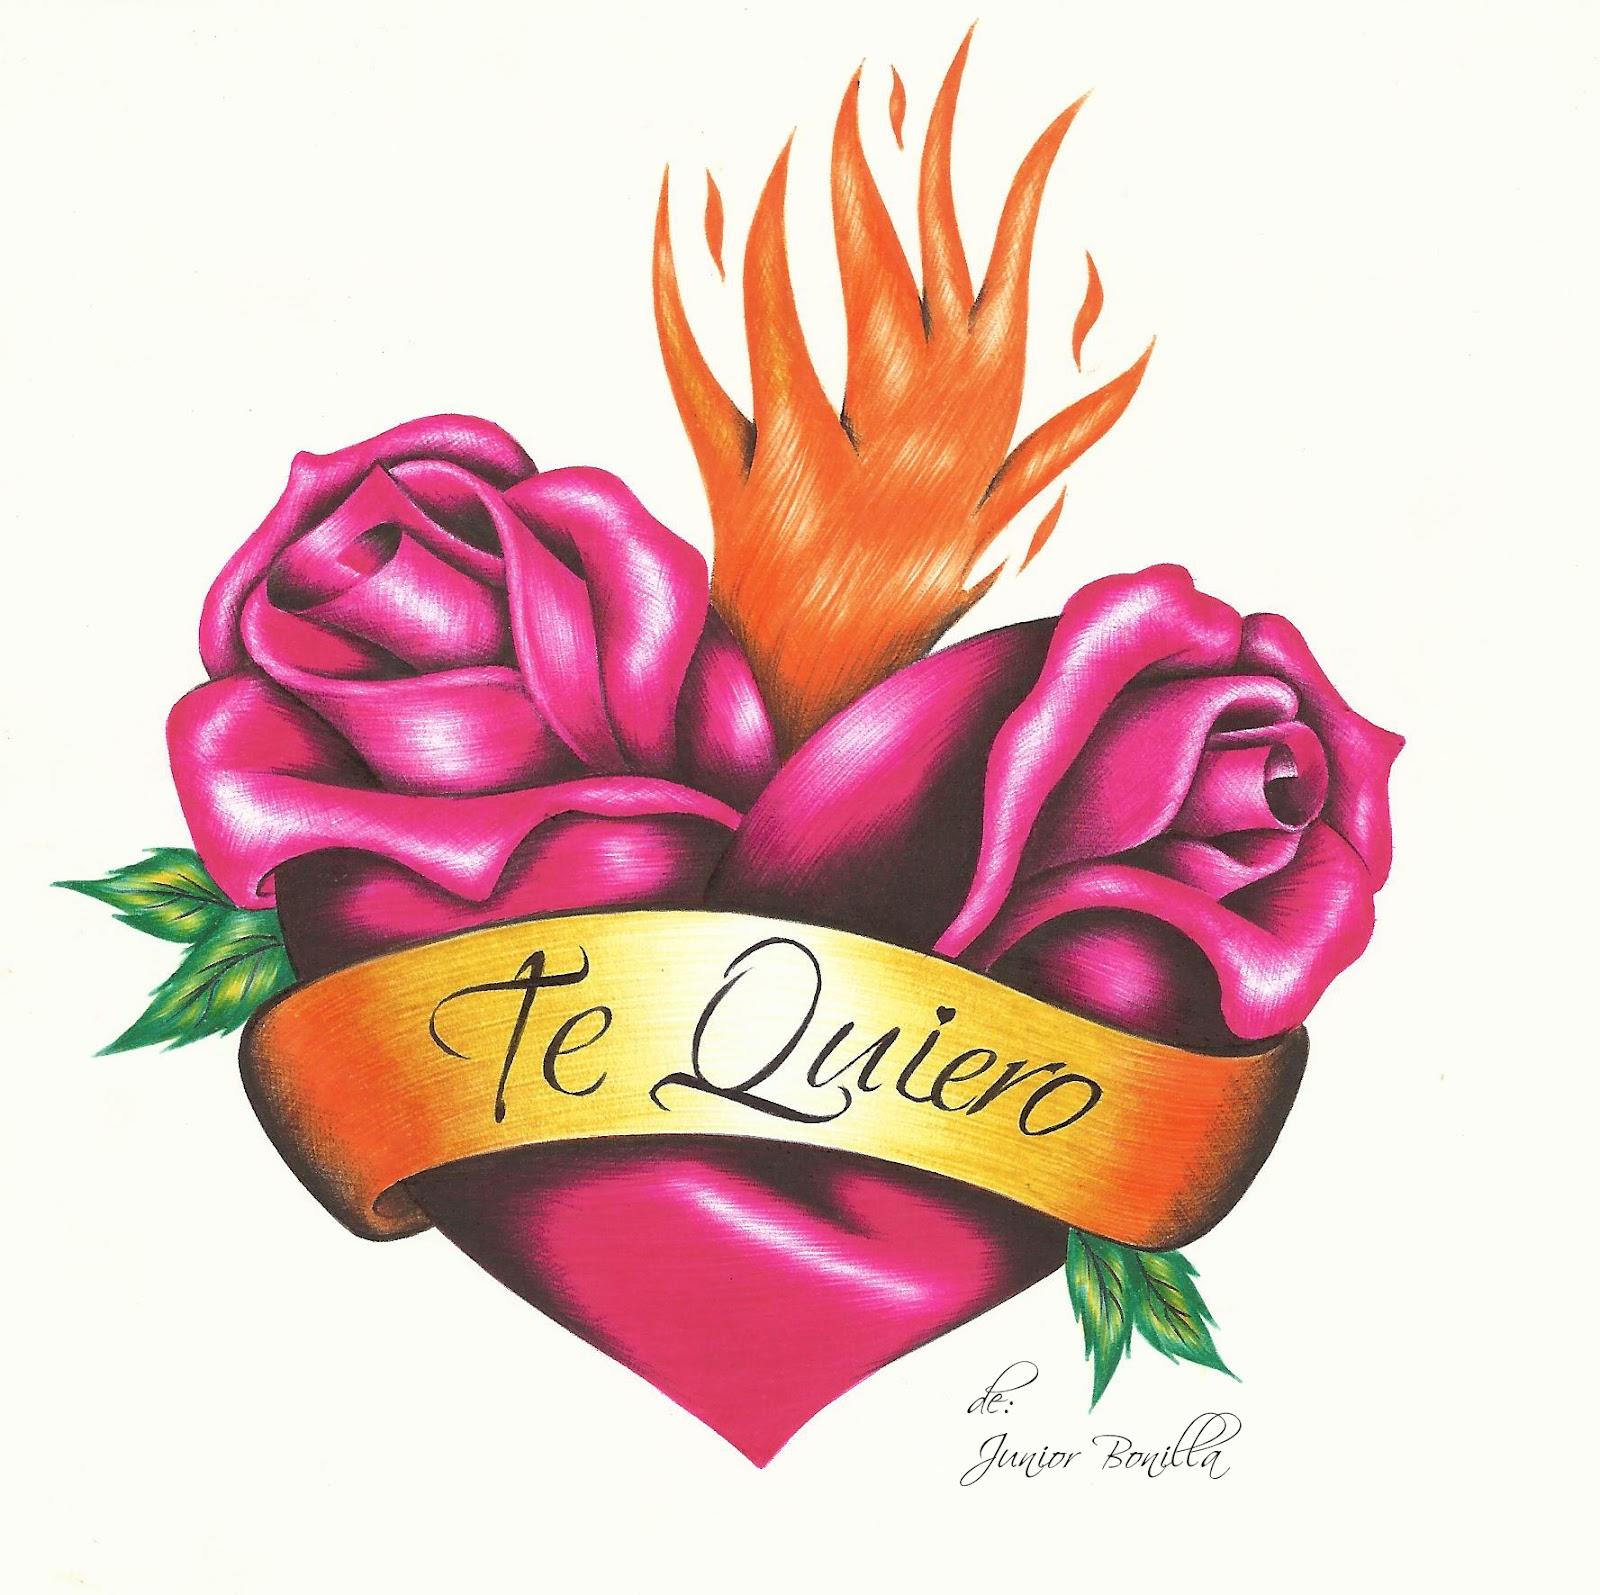 Imagenes De Rosas Que Digan Te Amo